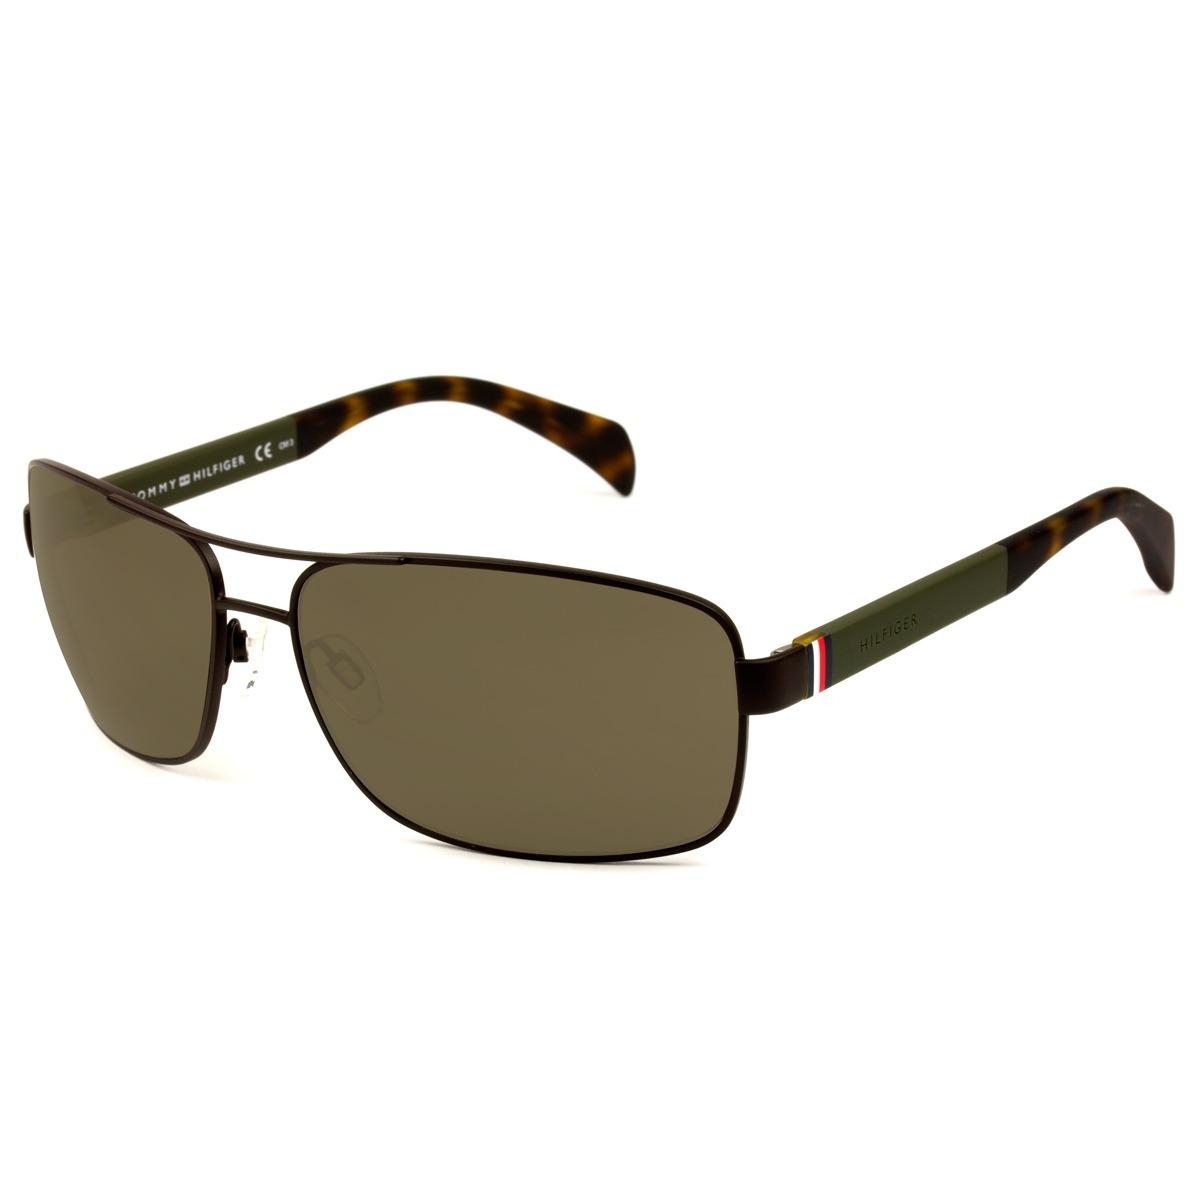 cce5750e5beab Óculos De Sol Tommy Hilfiger Th1258 s Nnc70 - R  330,00 em Mercado Livre